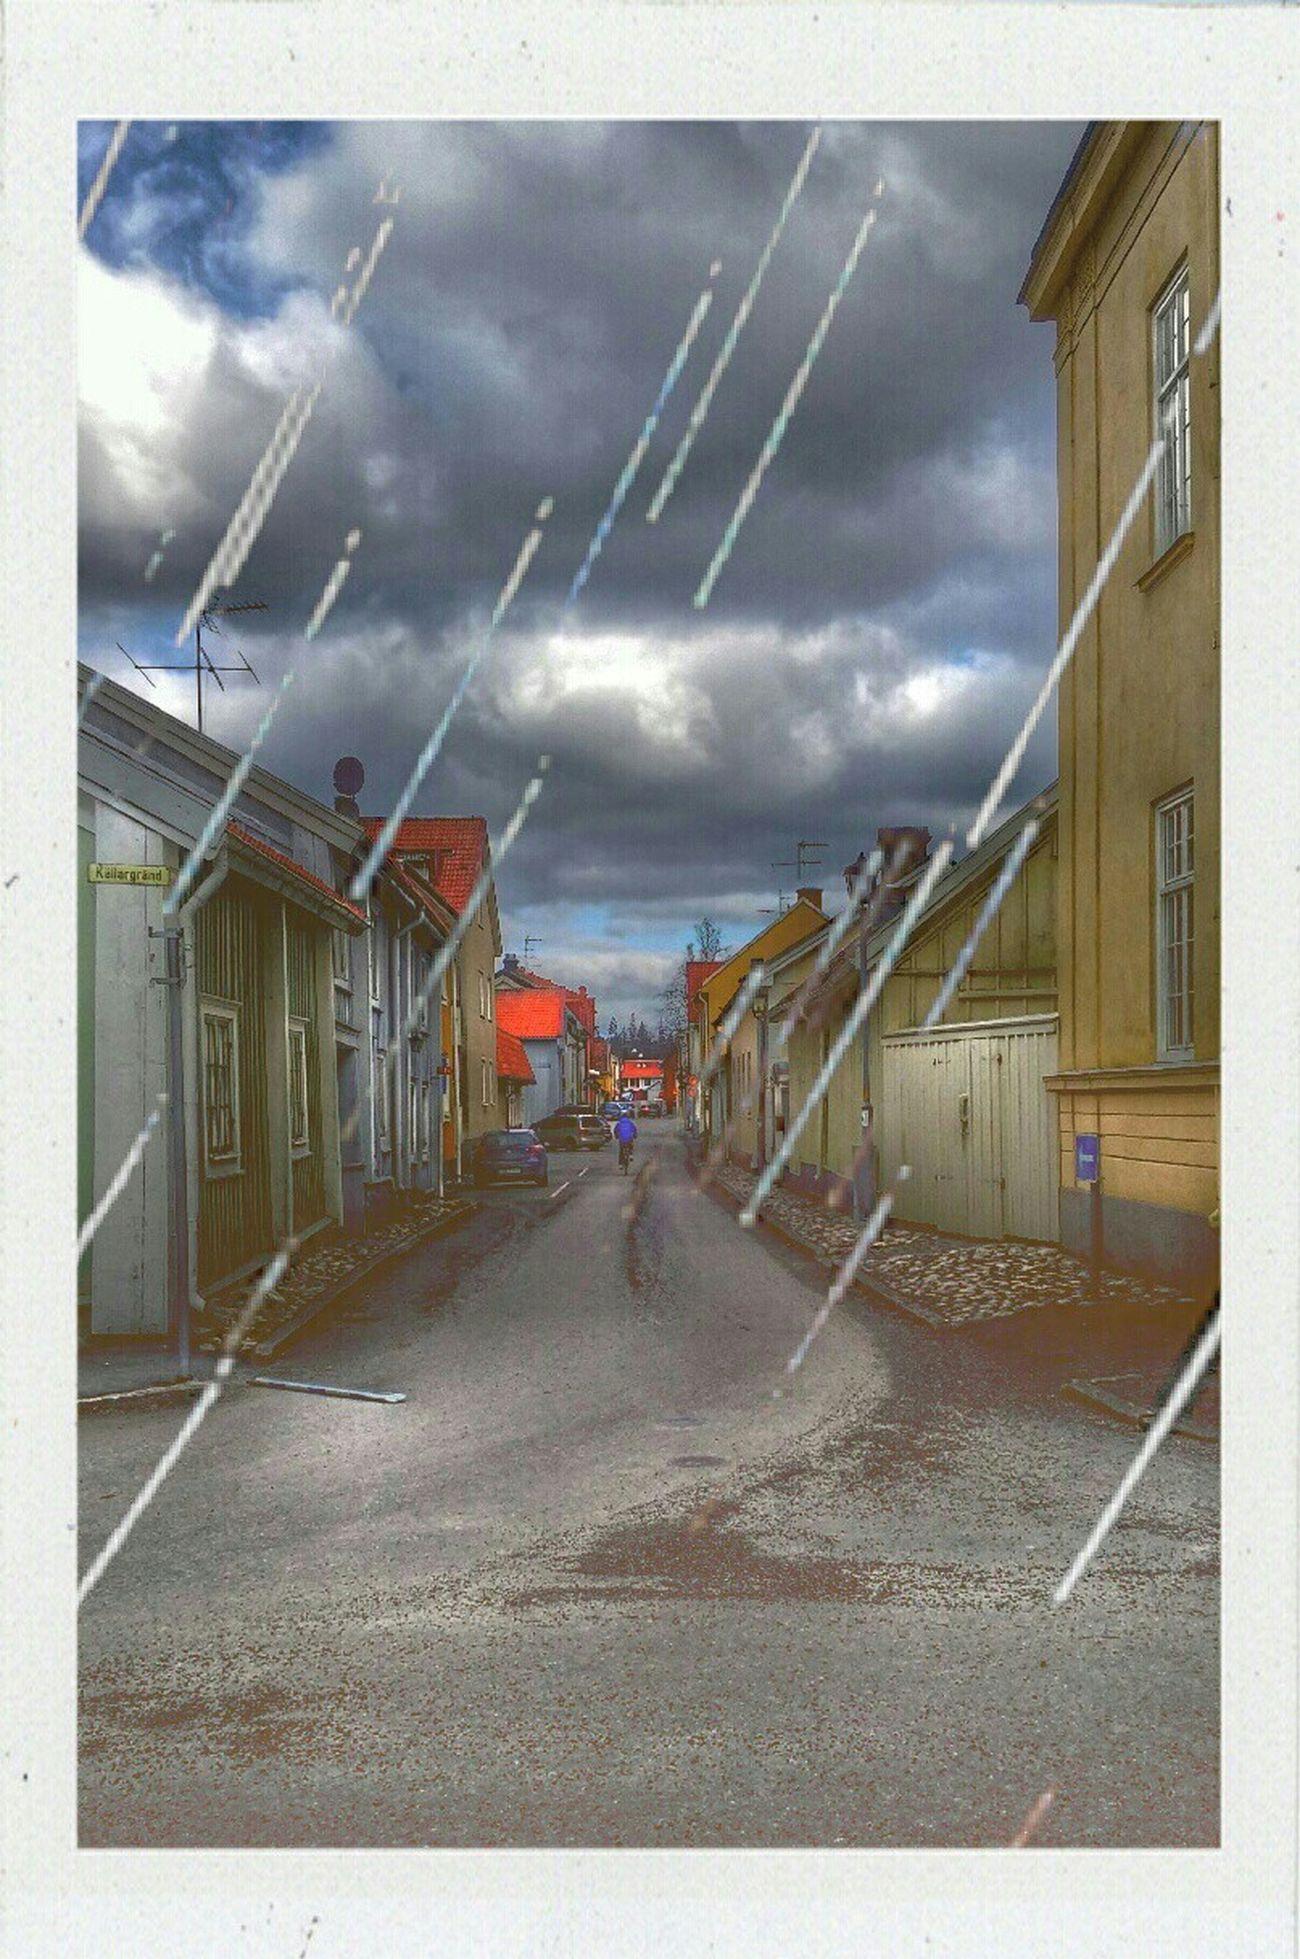 Rainy Days cloud - sky Building Exterior Sky Road Built Structure Streetphotography EyeEm Best Shots Best Of EyeEm Scenics Gripsholm Cold Temperature